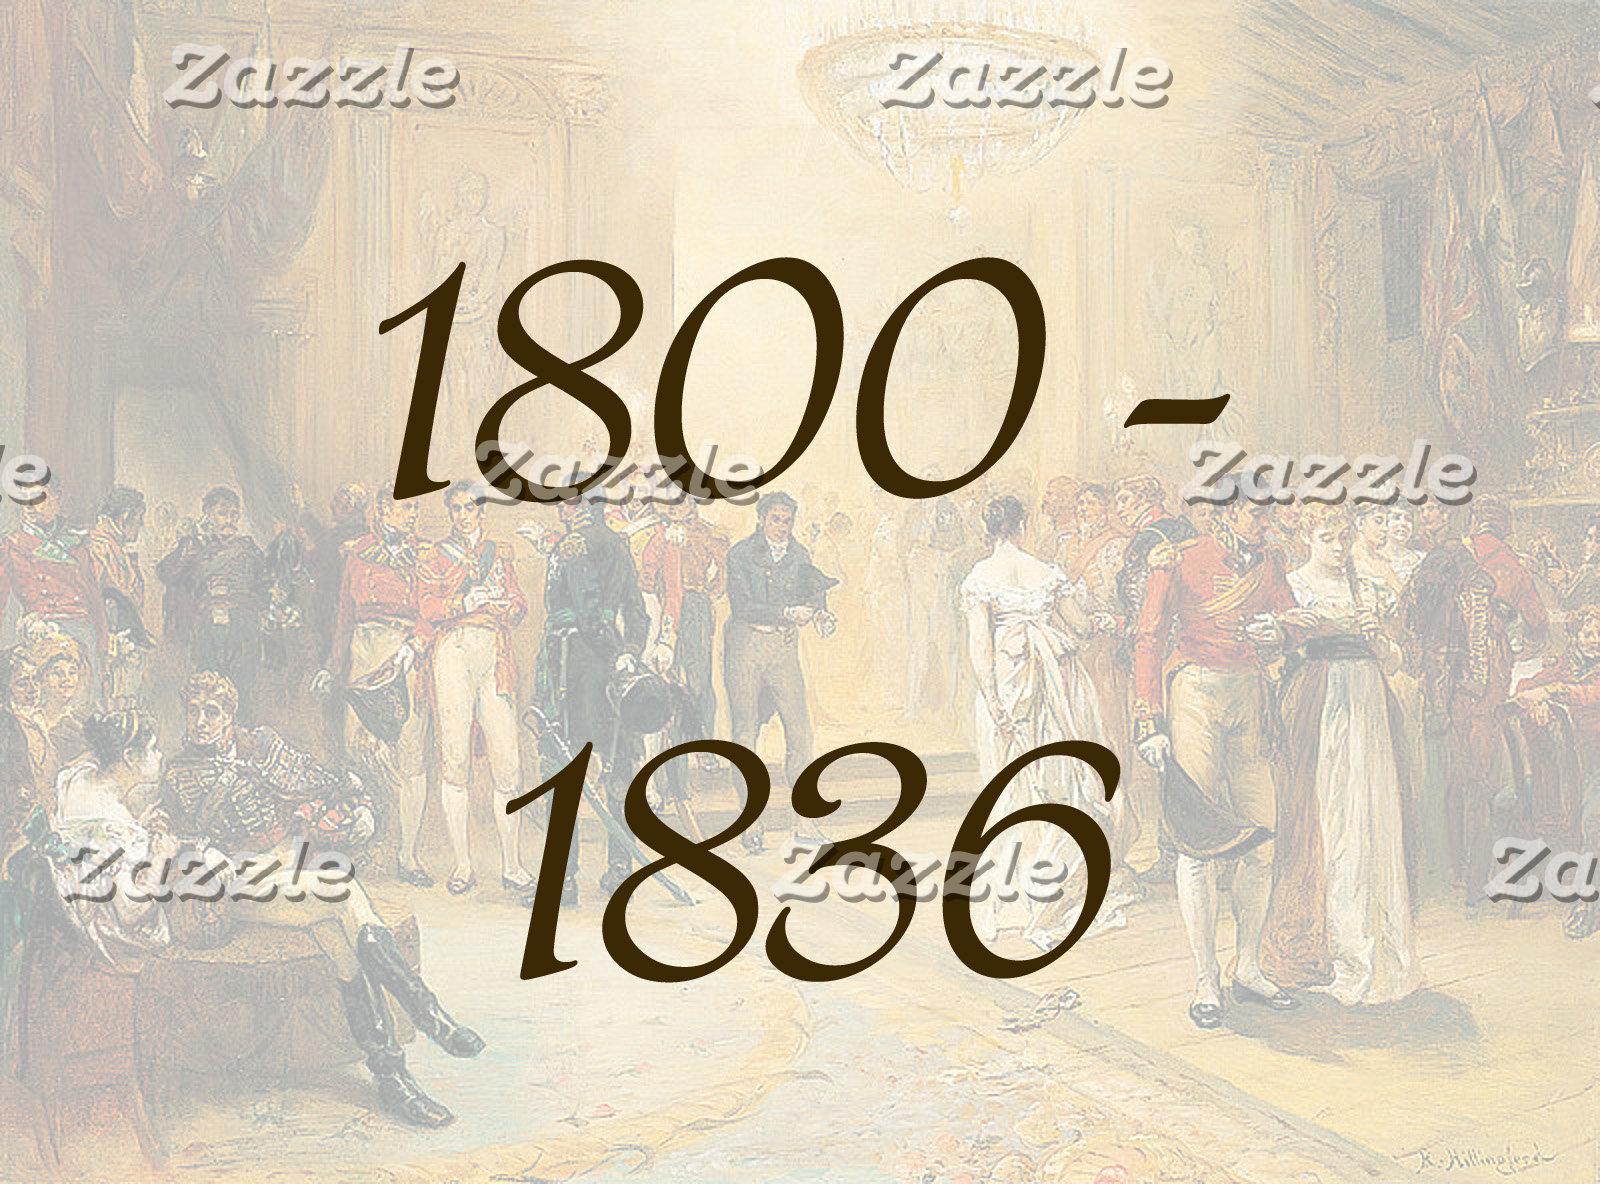 1800 - 1836